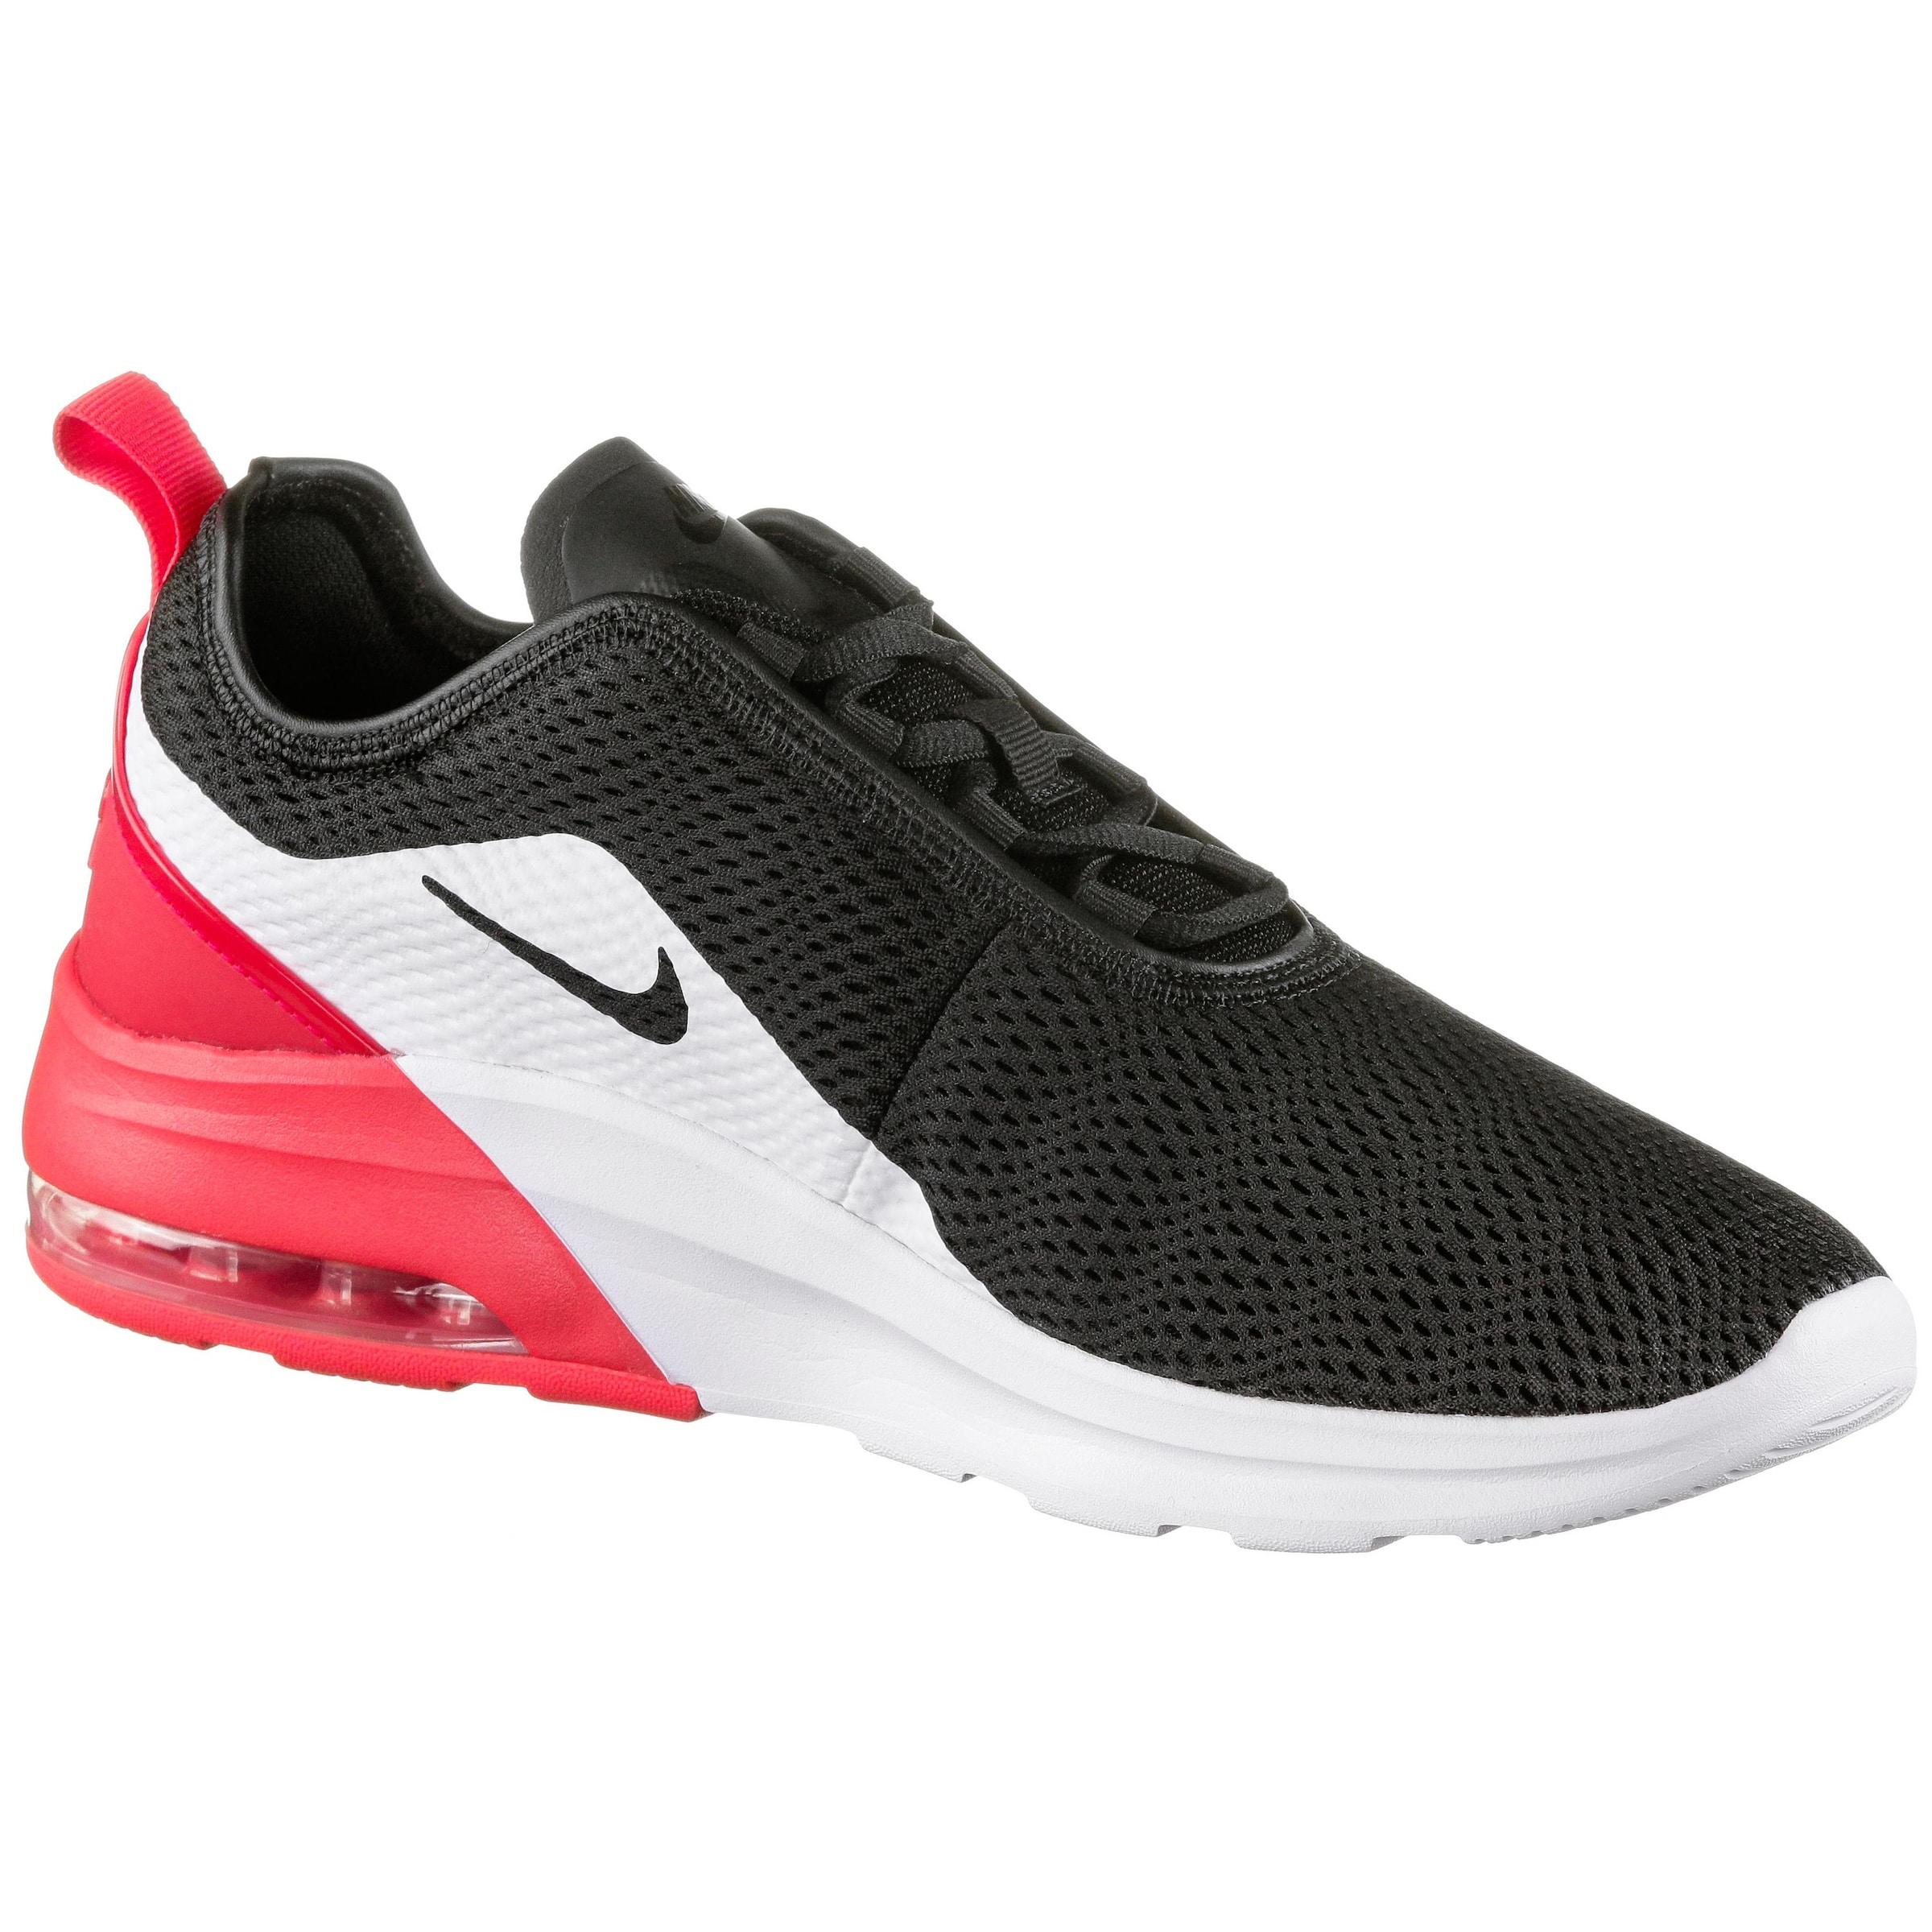 Nike In 2' CranberrySchwarz Weiß Max 'air Sneaker Sportswear Motion POn08kw